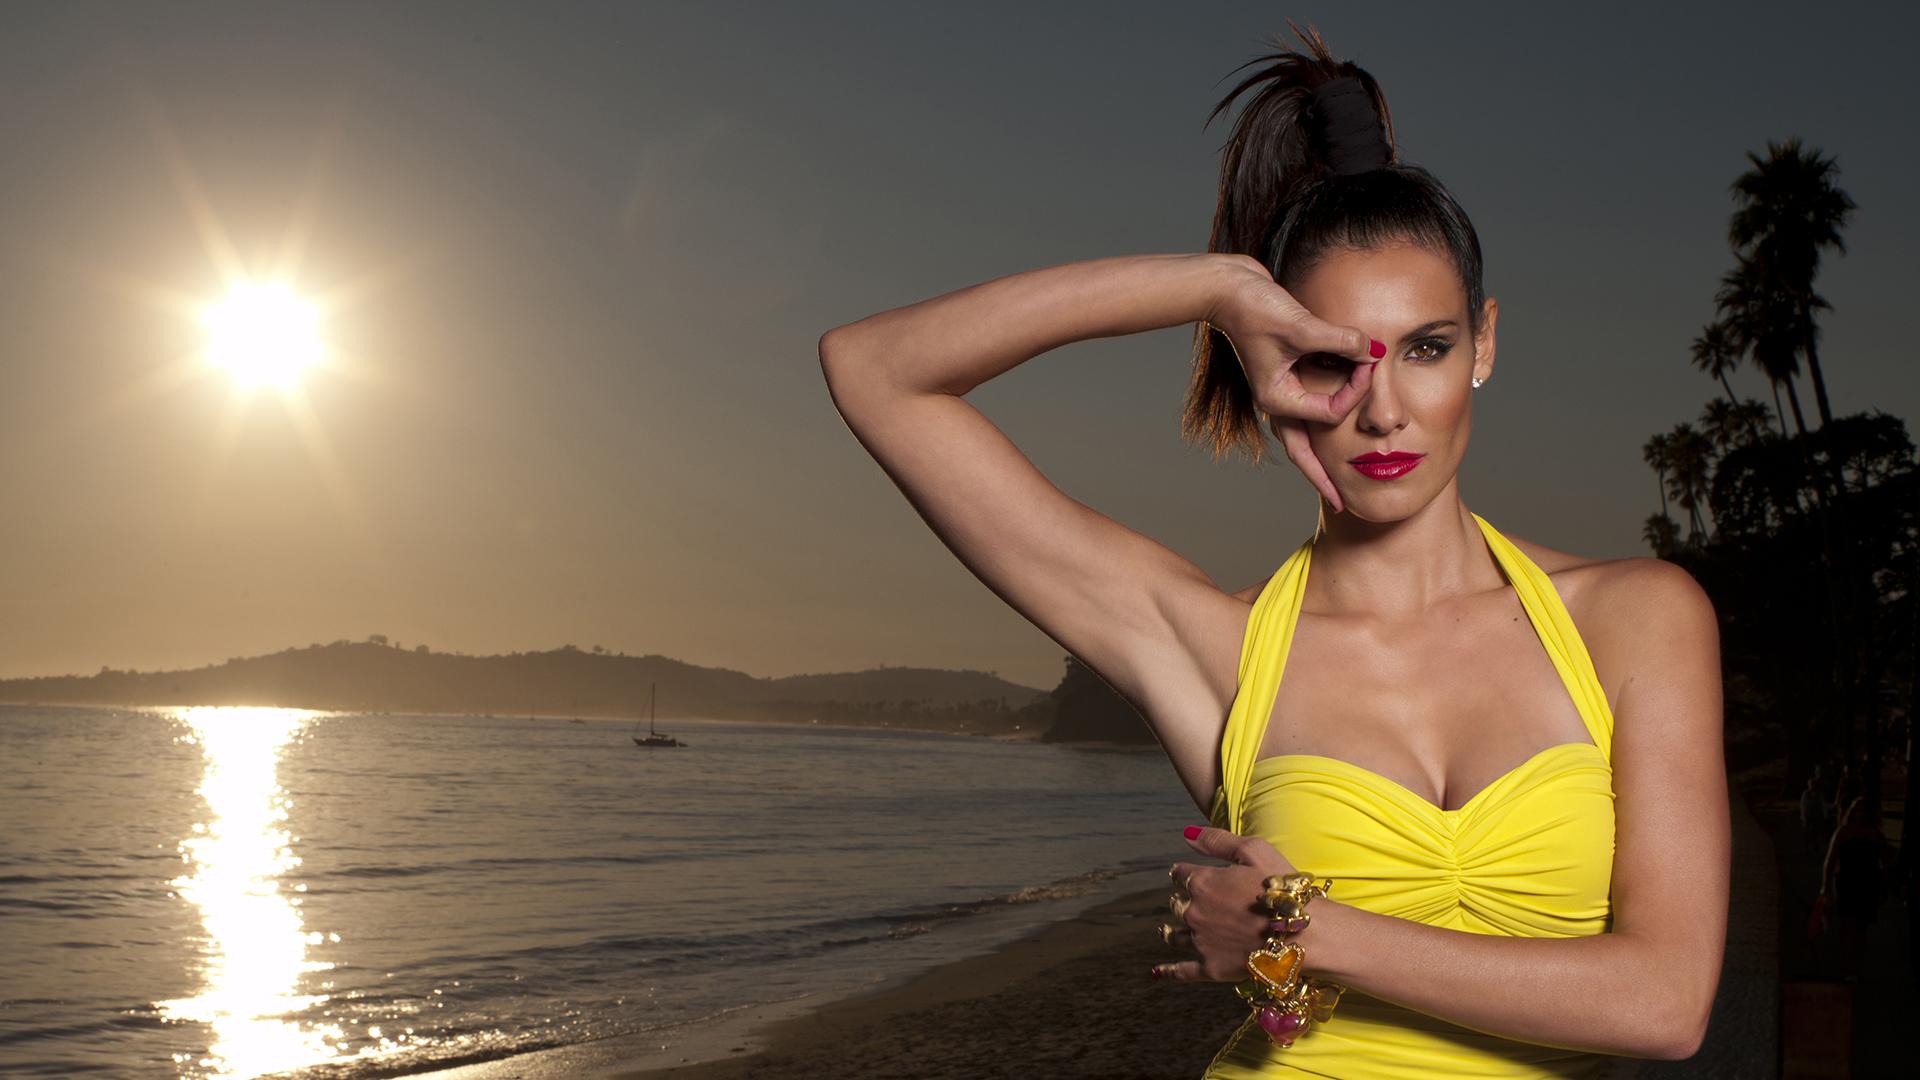 Daniela Ruah is having a photo shoot at the beach. She looks stunning on her yellow swim wear.